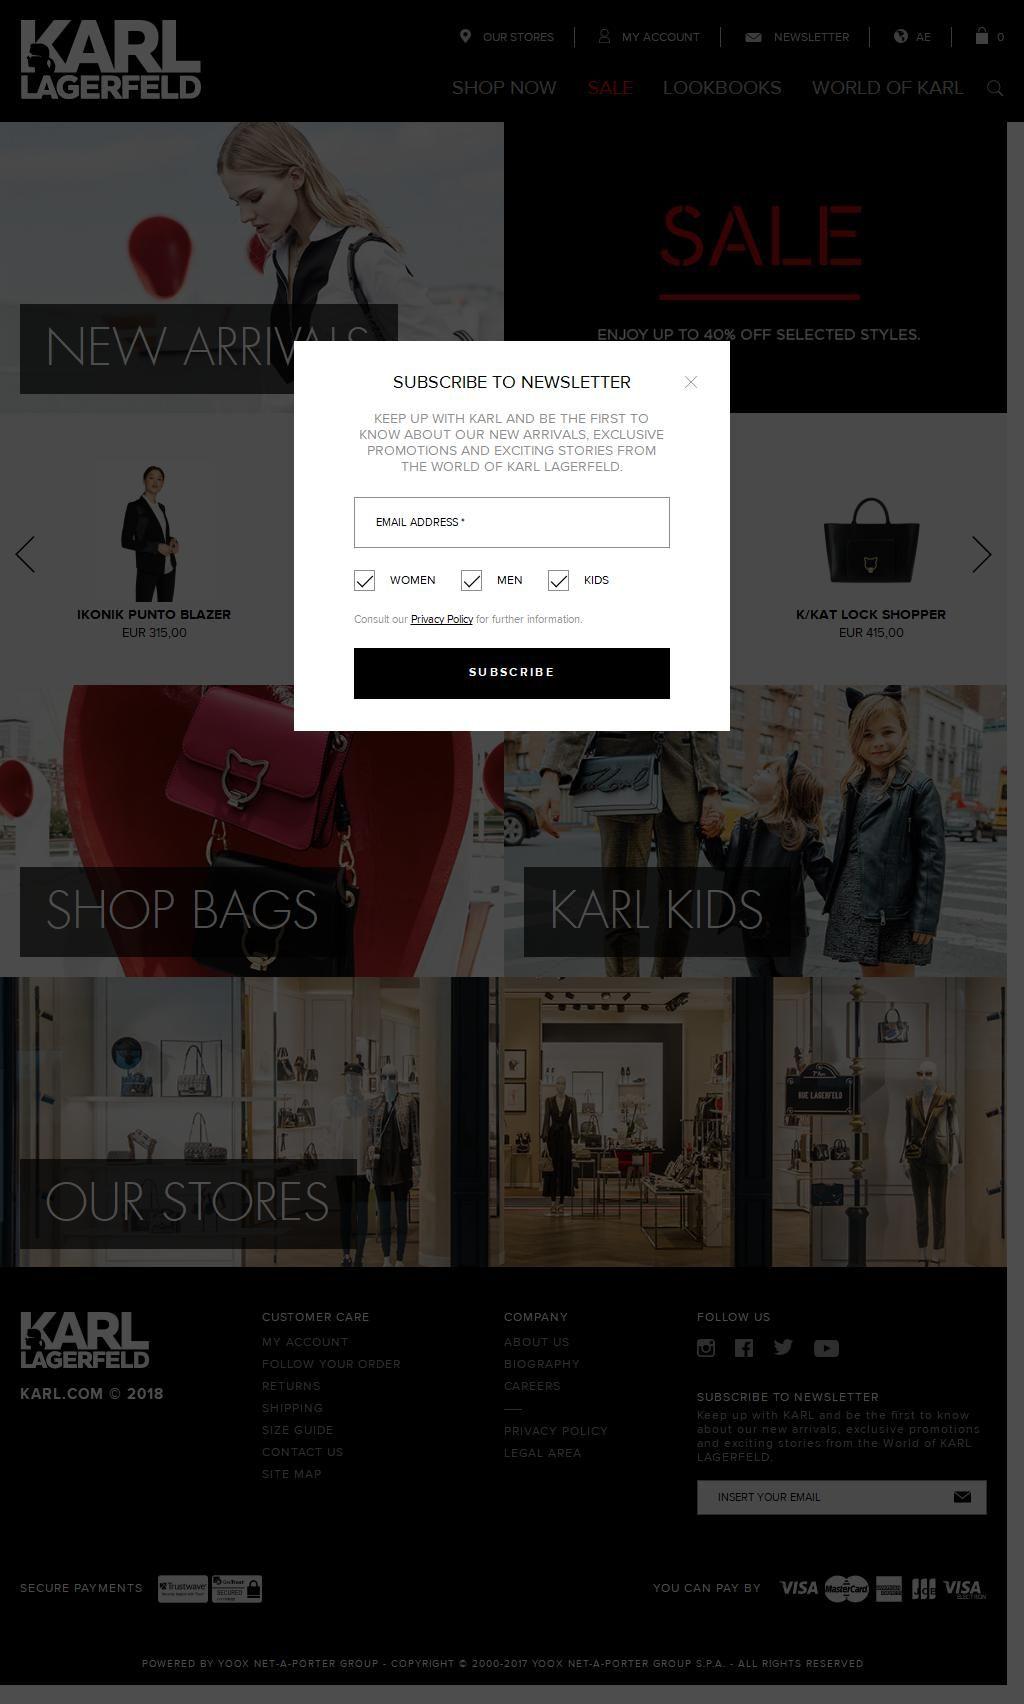 Karl Lagerfeld Shop The Dubai Mall, 3, Mohammed Bin Rashid